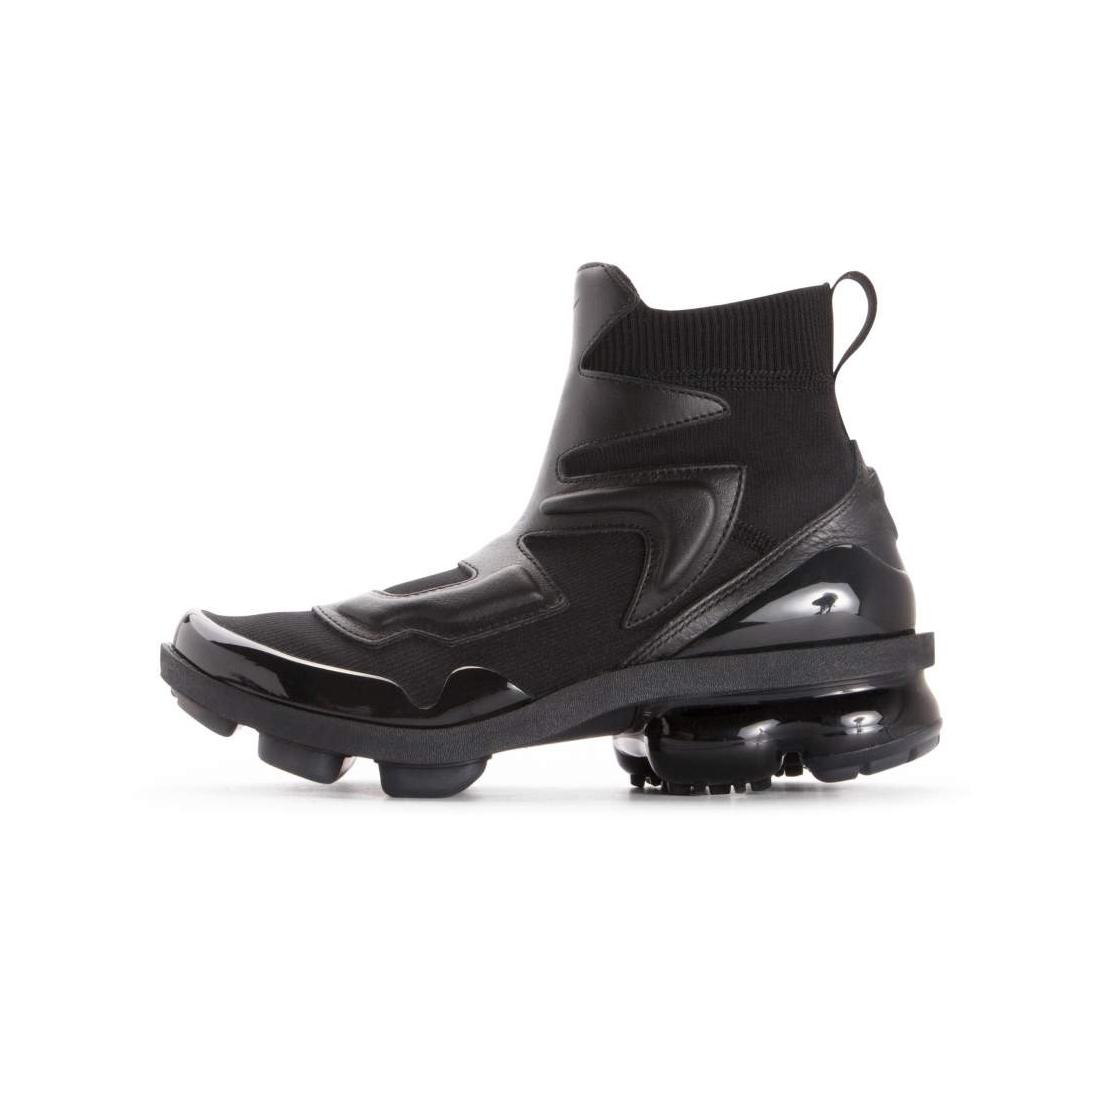 competitive price ff313 2c5bd Nike wmns air vapormax light ii black ao4537 001 1